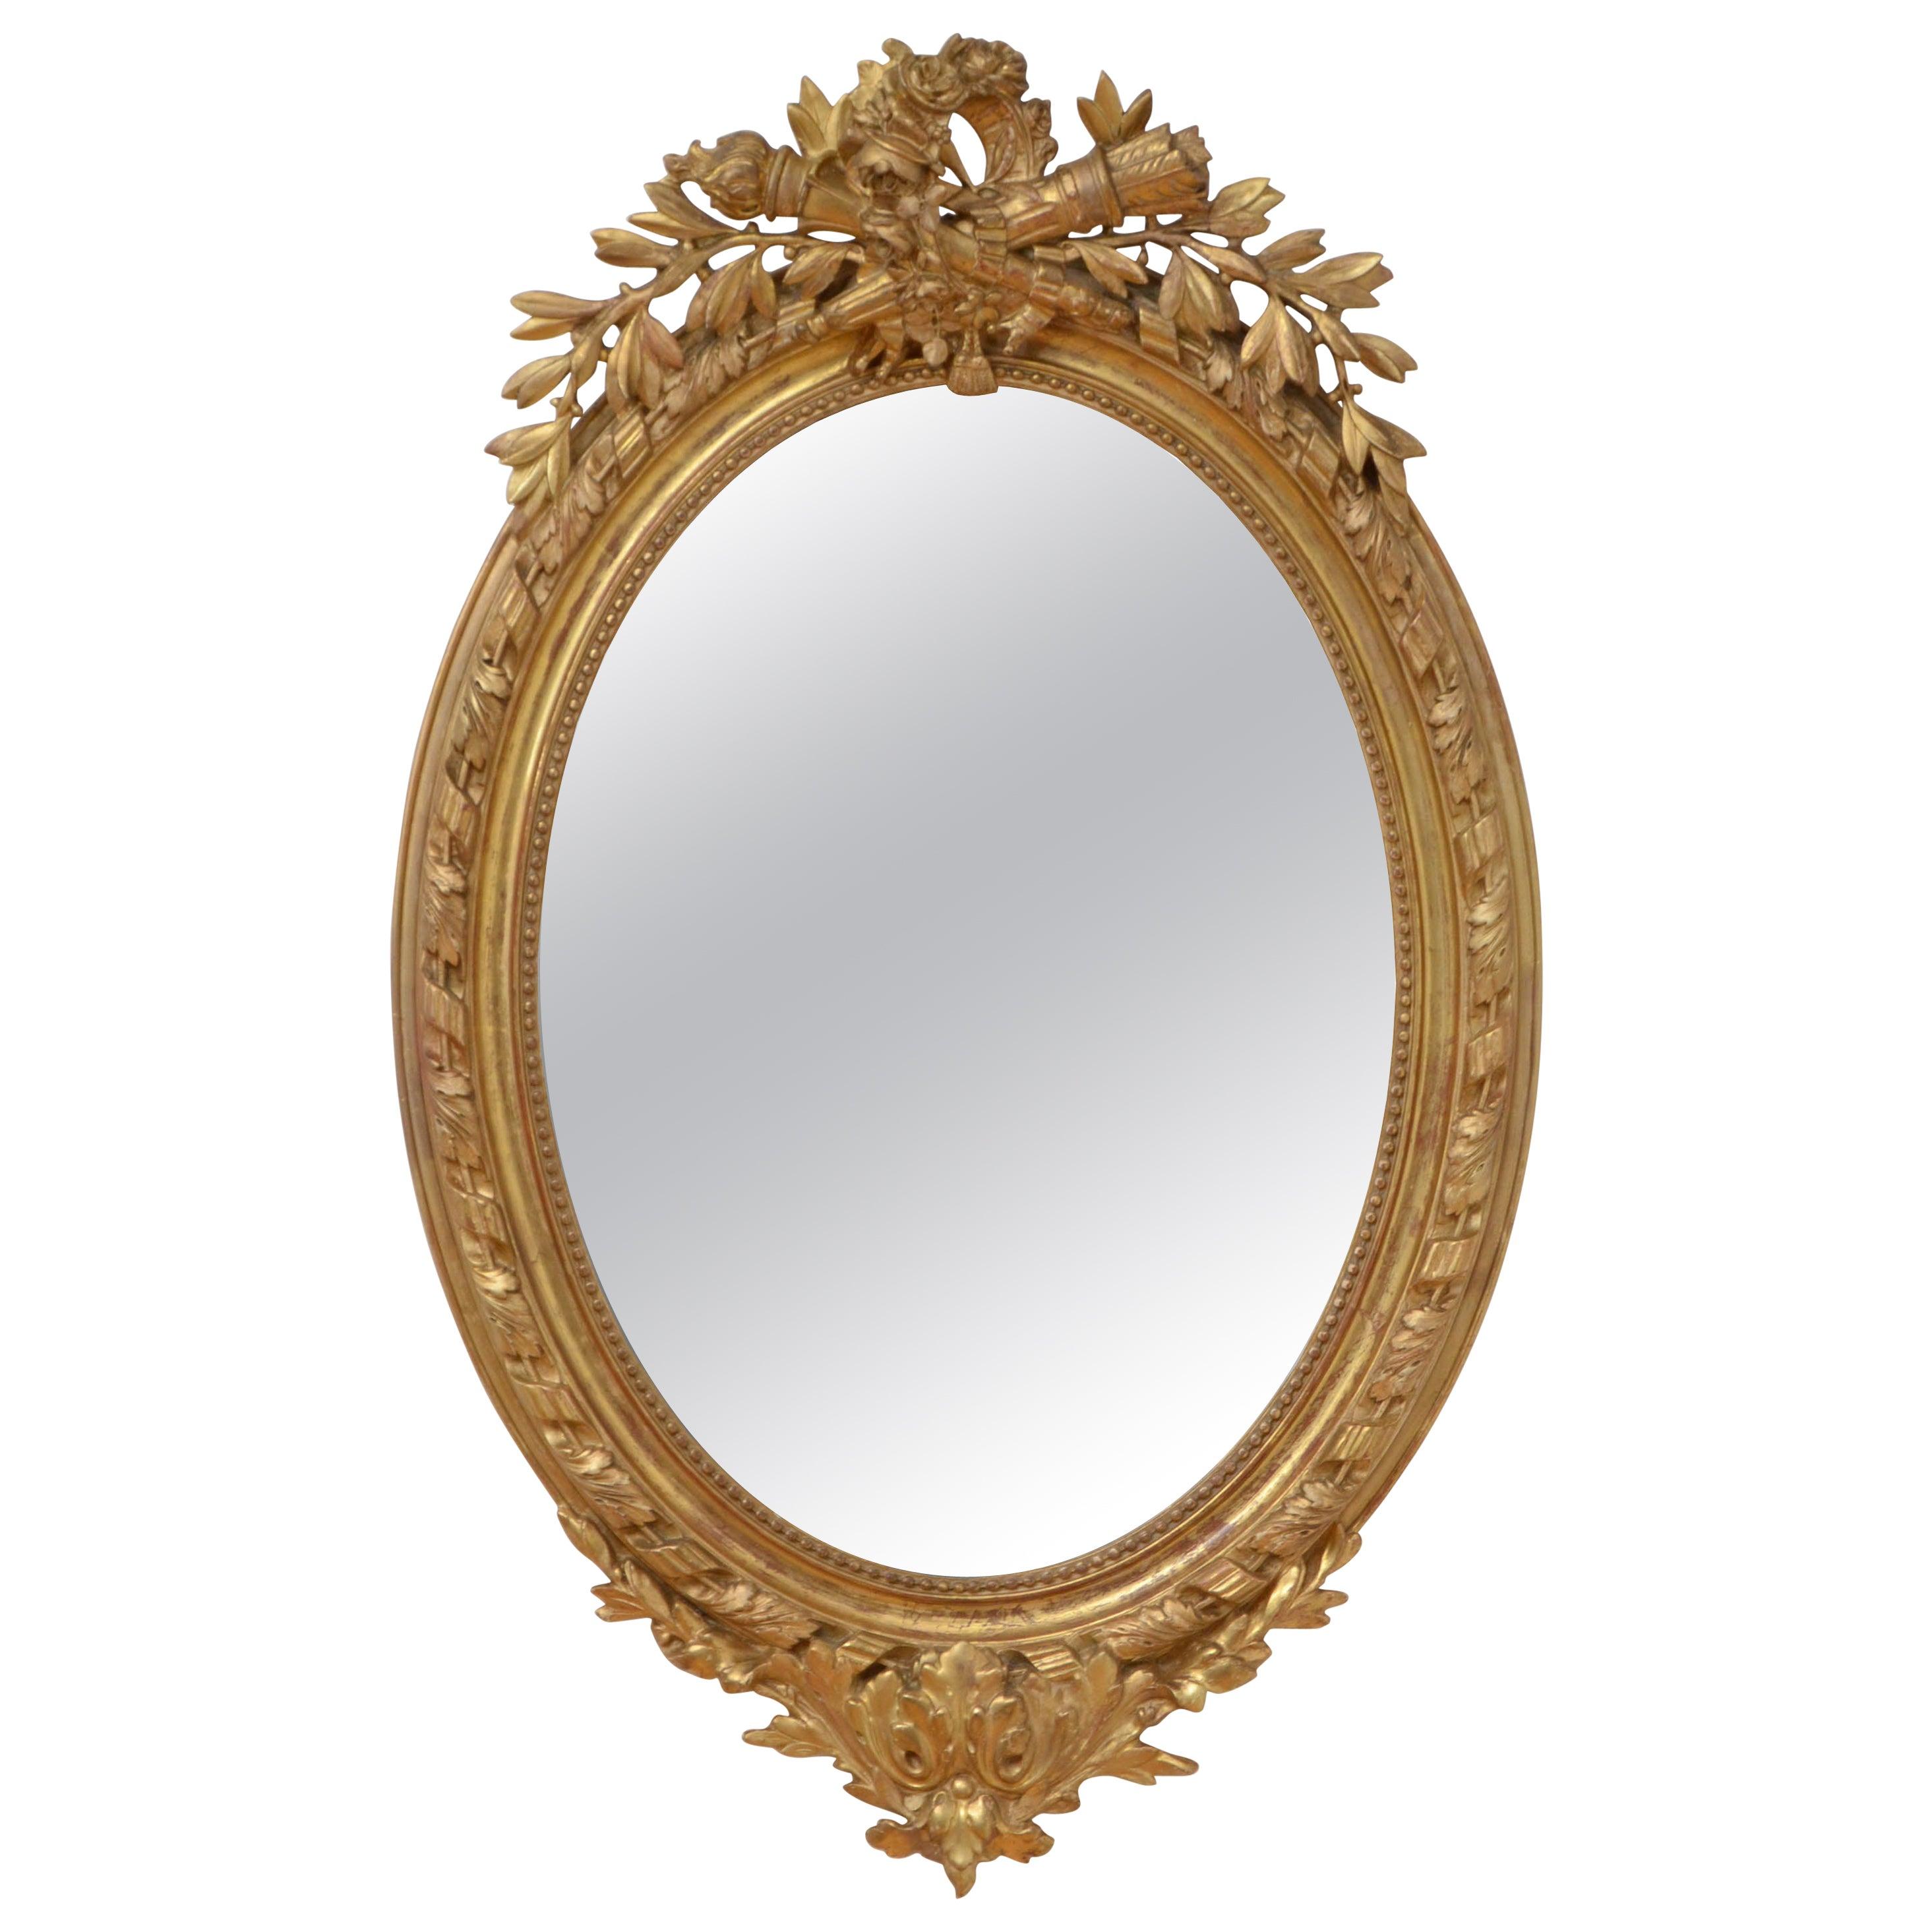 19th Century French Gilt Wall Mirror